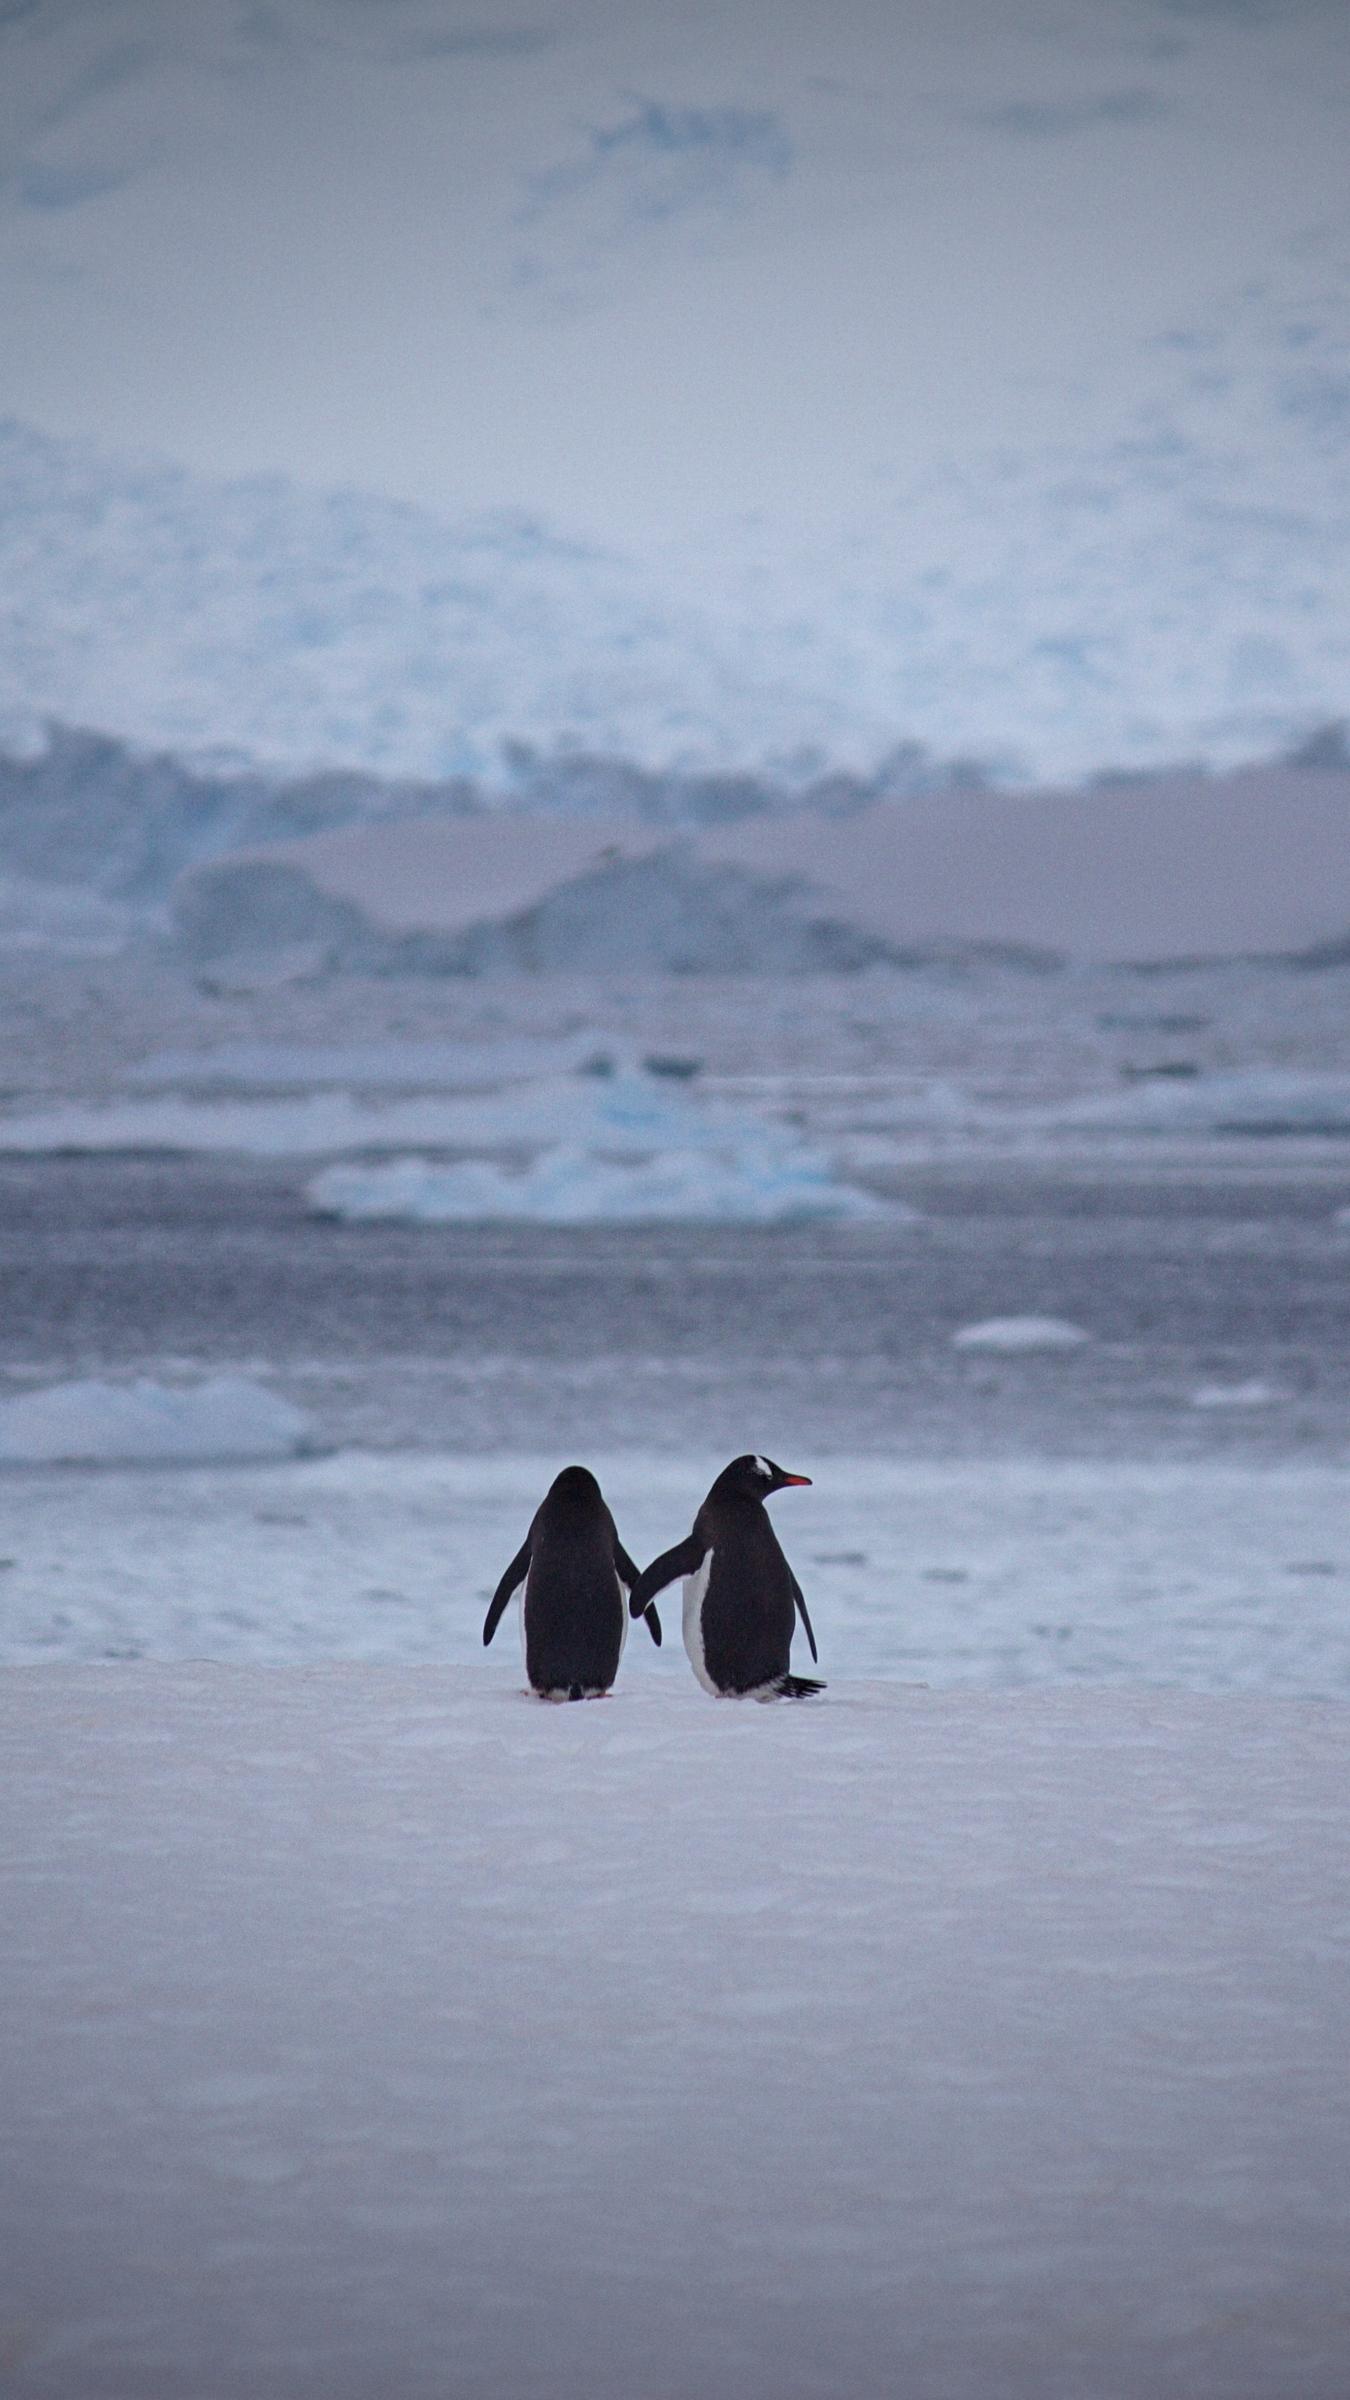 Download wallpaper 1350x2400 penguins couple snow walk iphone 1350x2400